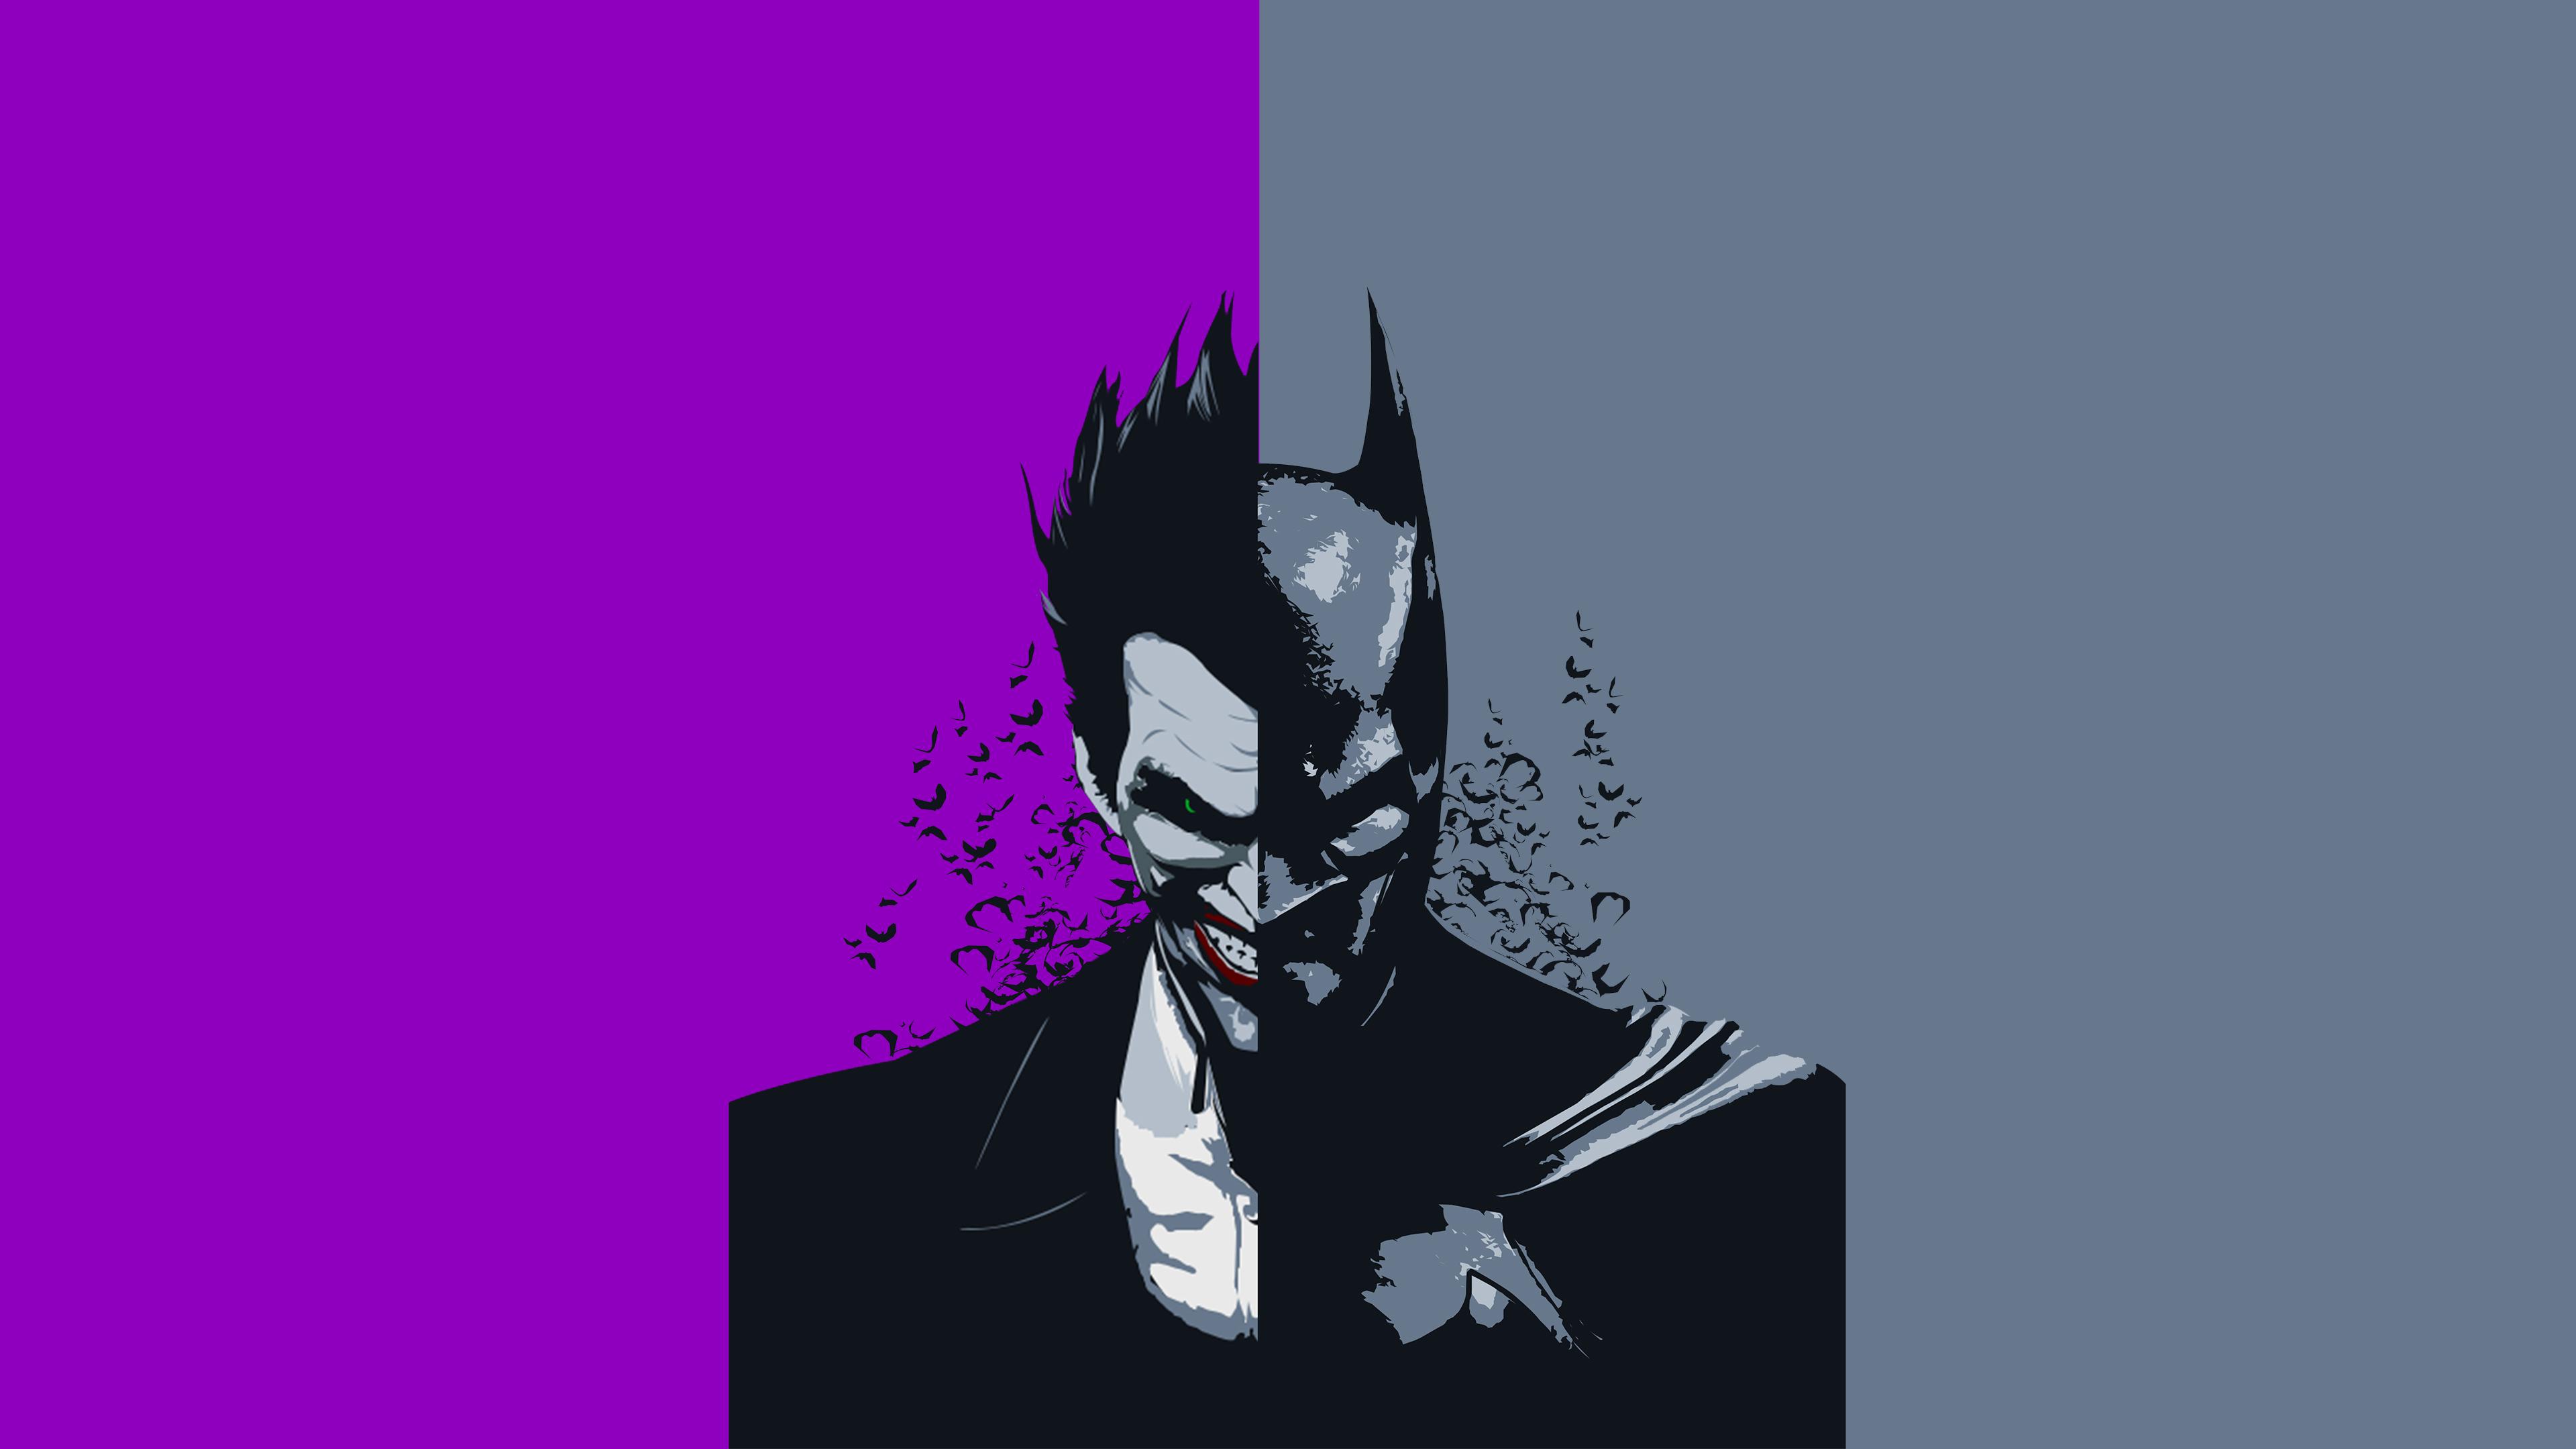 batman joker new art 4k 1553071267 - Batman Joker New Art 4k - superheroes wallpapers, joker wallpapers, hd-wallpapers, dc comics wallpapers, behance wallpapers, batman wallpapers, 4k-wallpapers